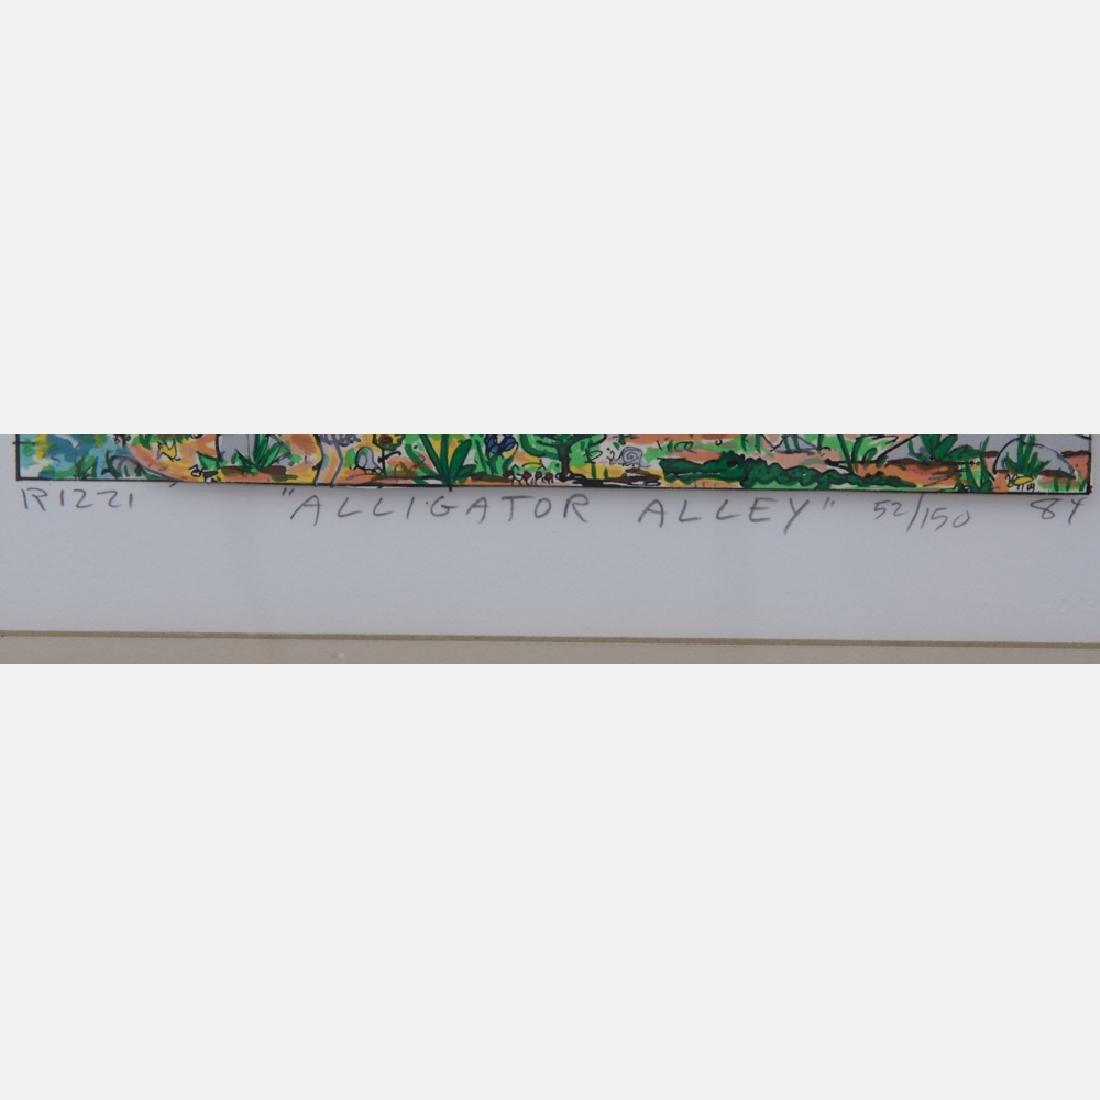 James Rizzi (1950-2011) Alligator Alley, 3D serigraph, - 3